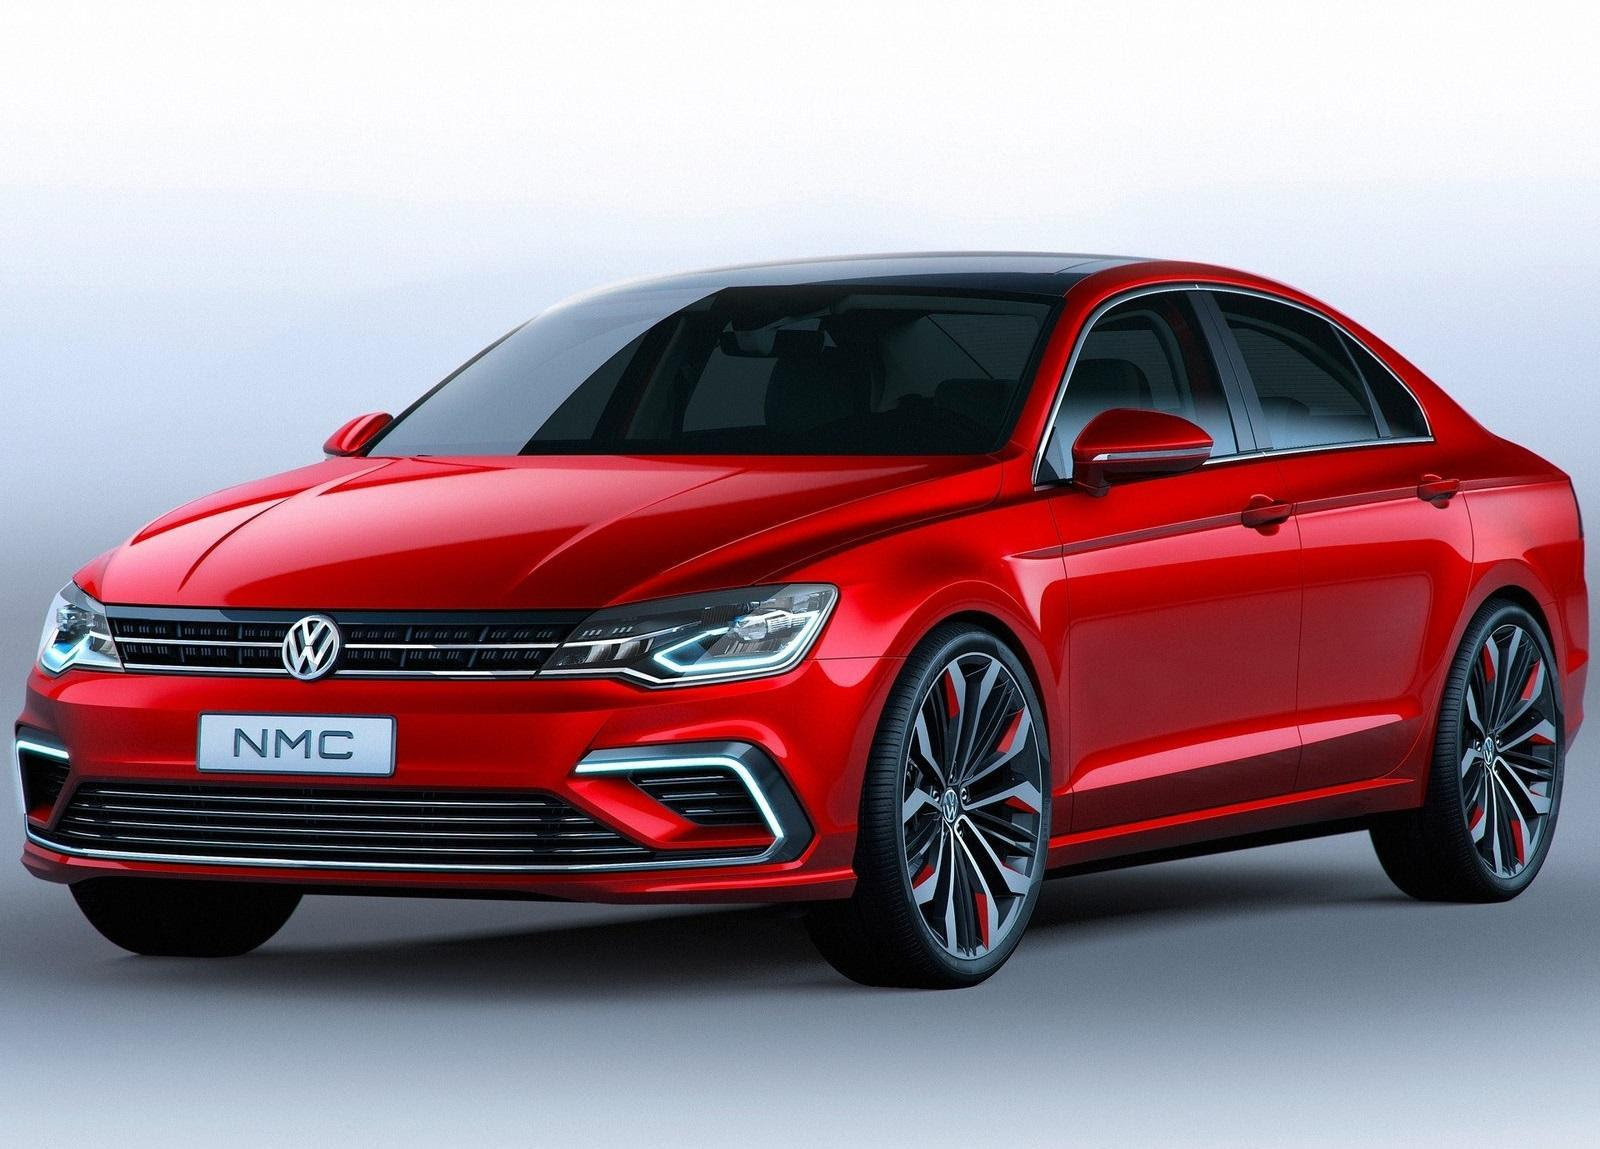 Novo Volkswagen Jetta 2016 – Lançamento e Preço no Brasil ...